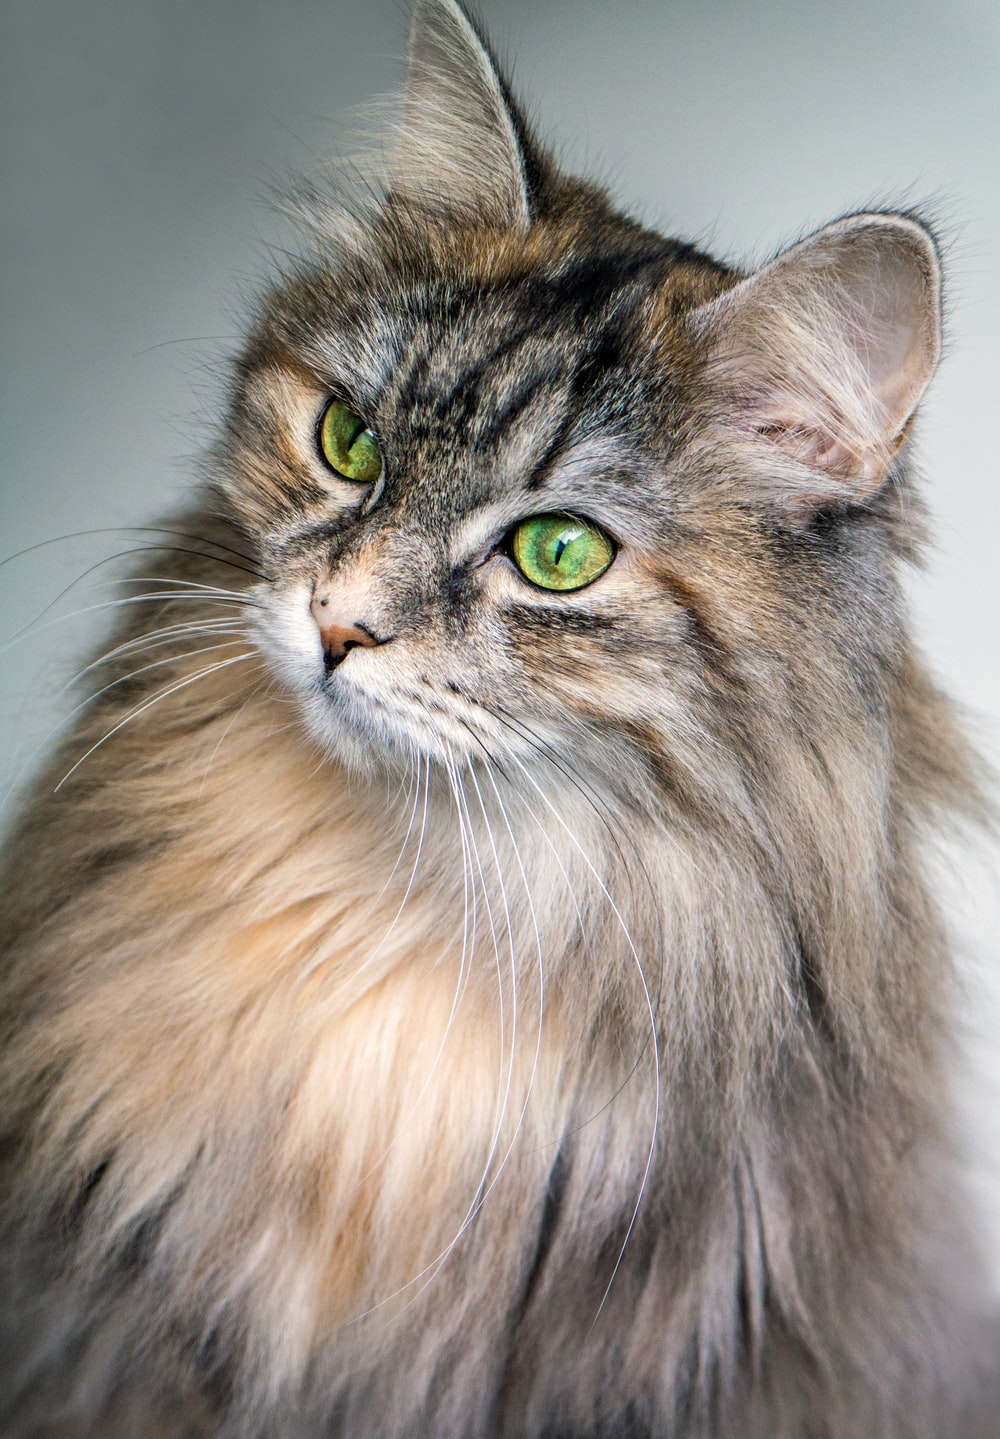 focus photography of long-fur brown cat